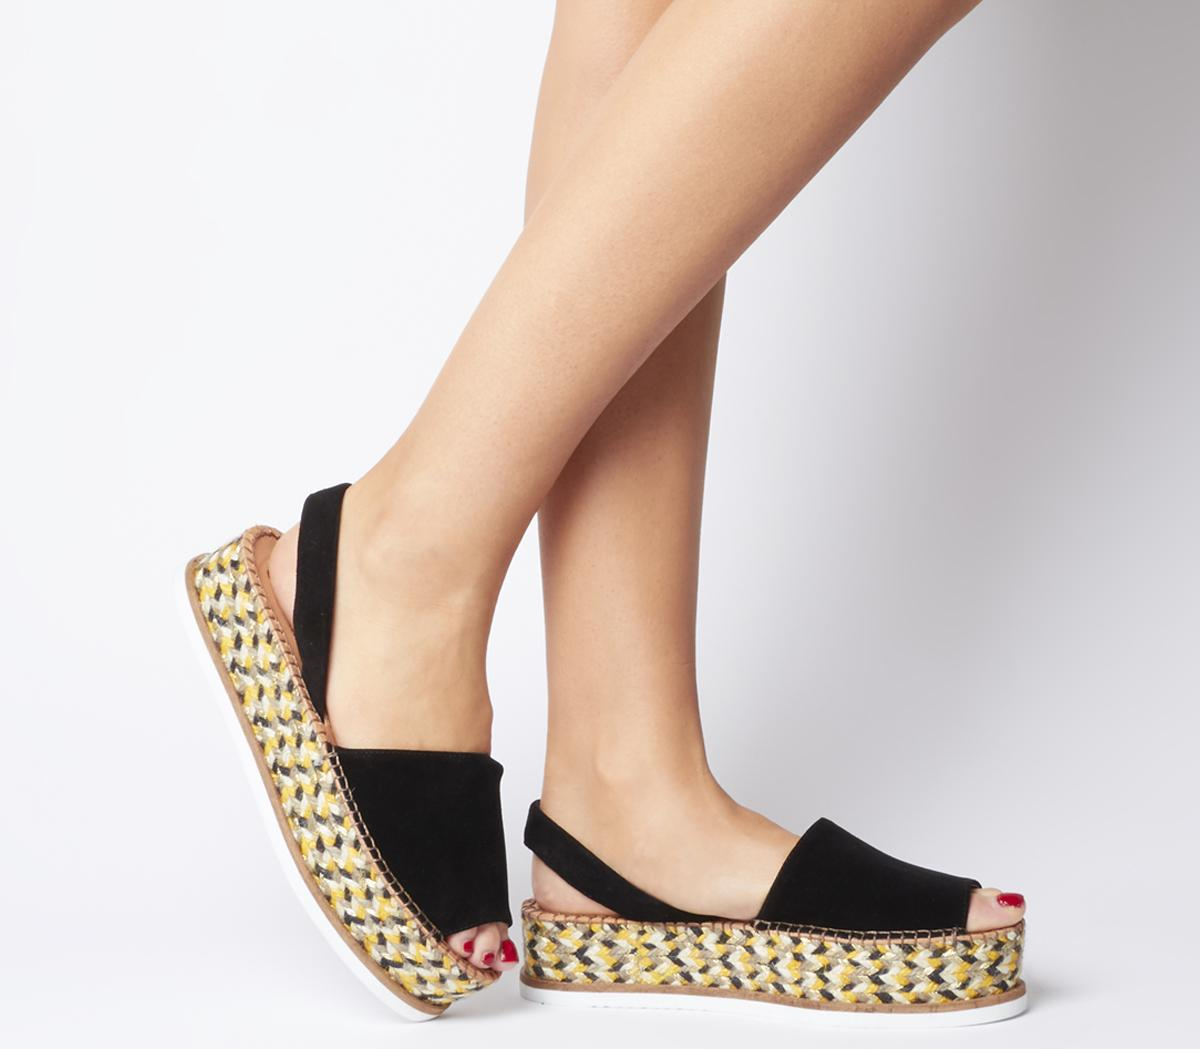 Julio Flatform Mules Black Suede - Sandals